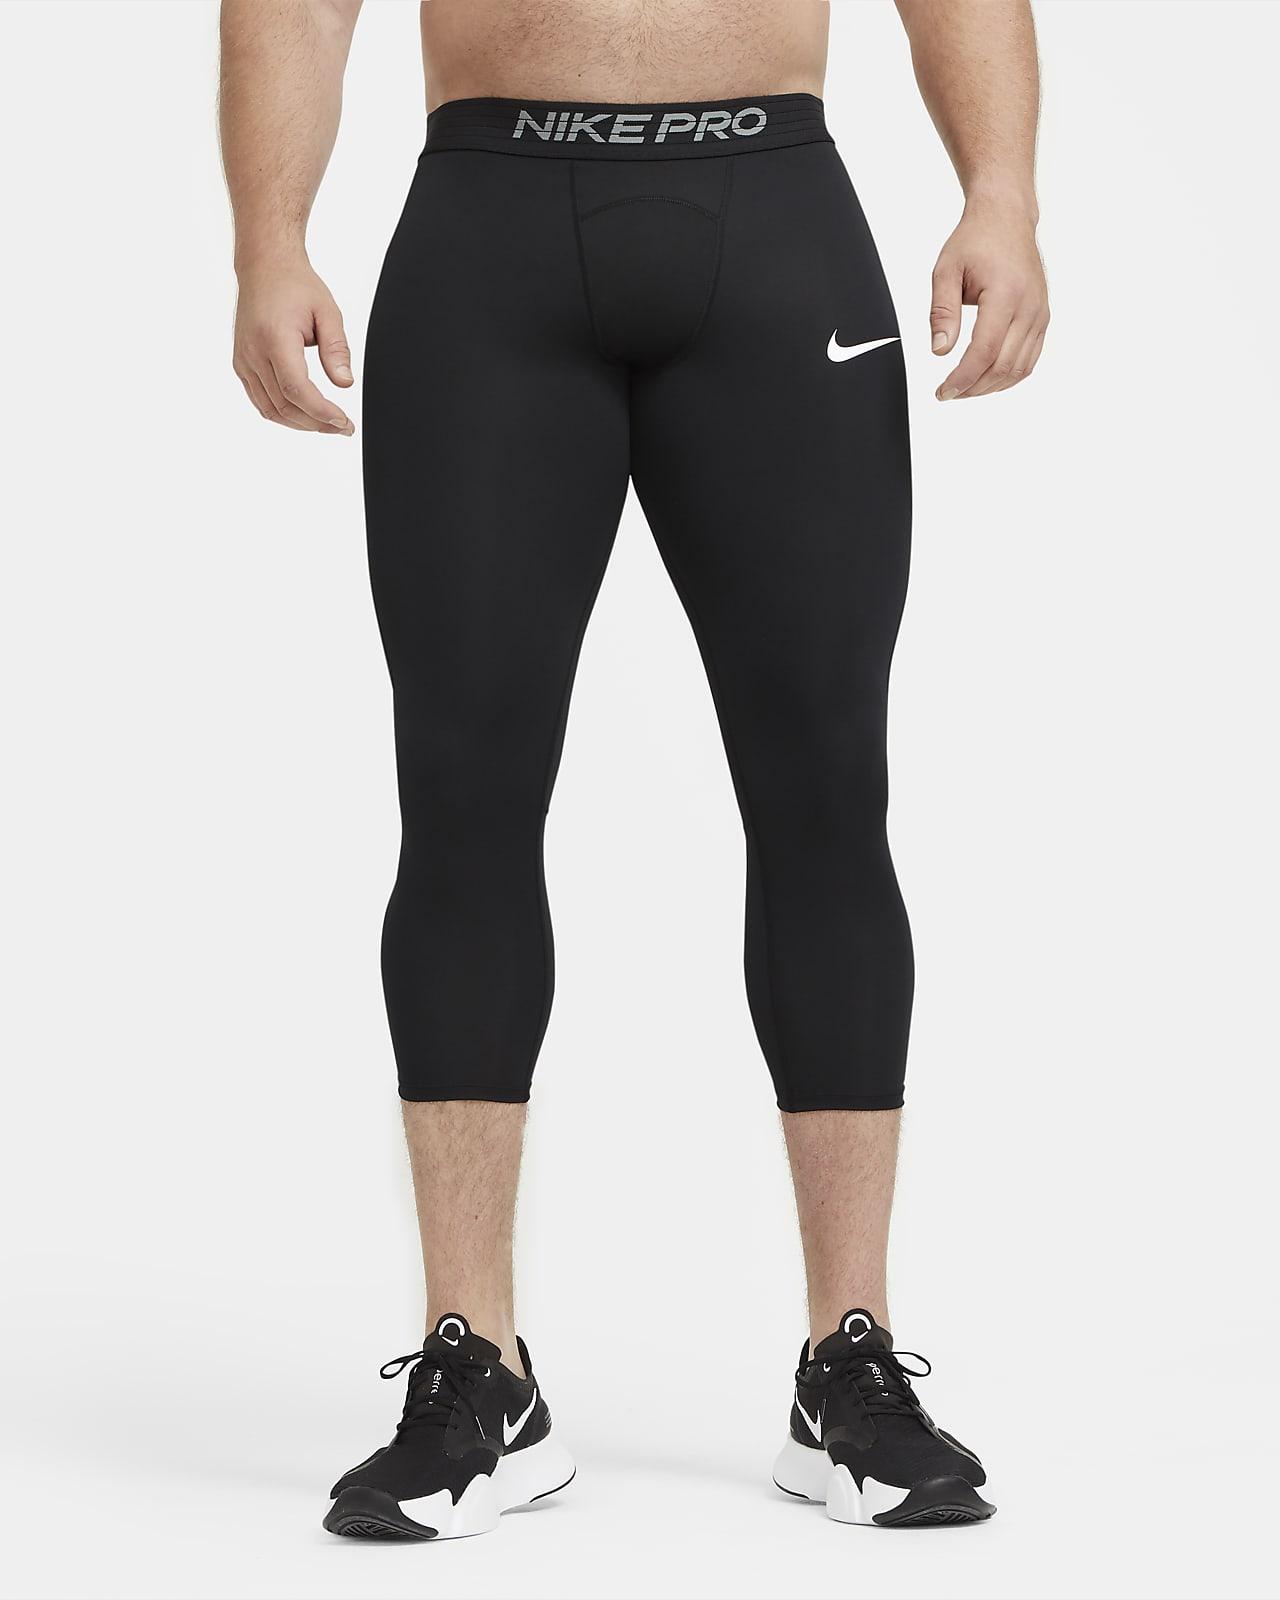 Nike Pro Men's 3/4 Tights. Nike LU